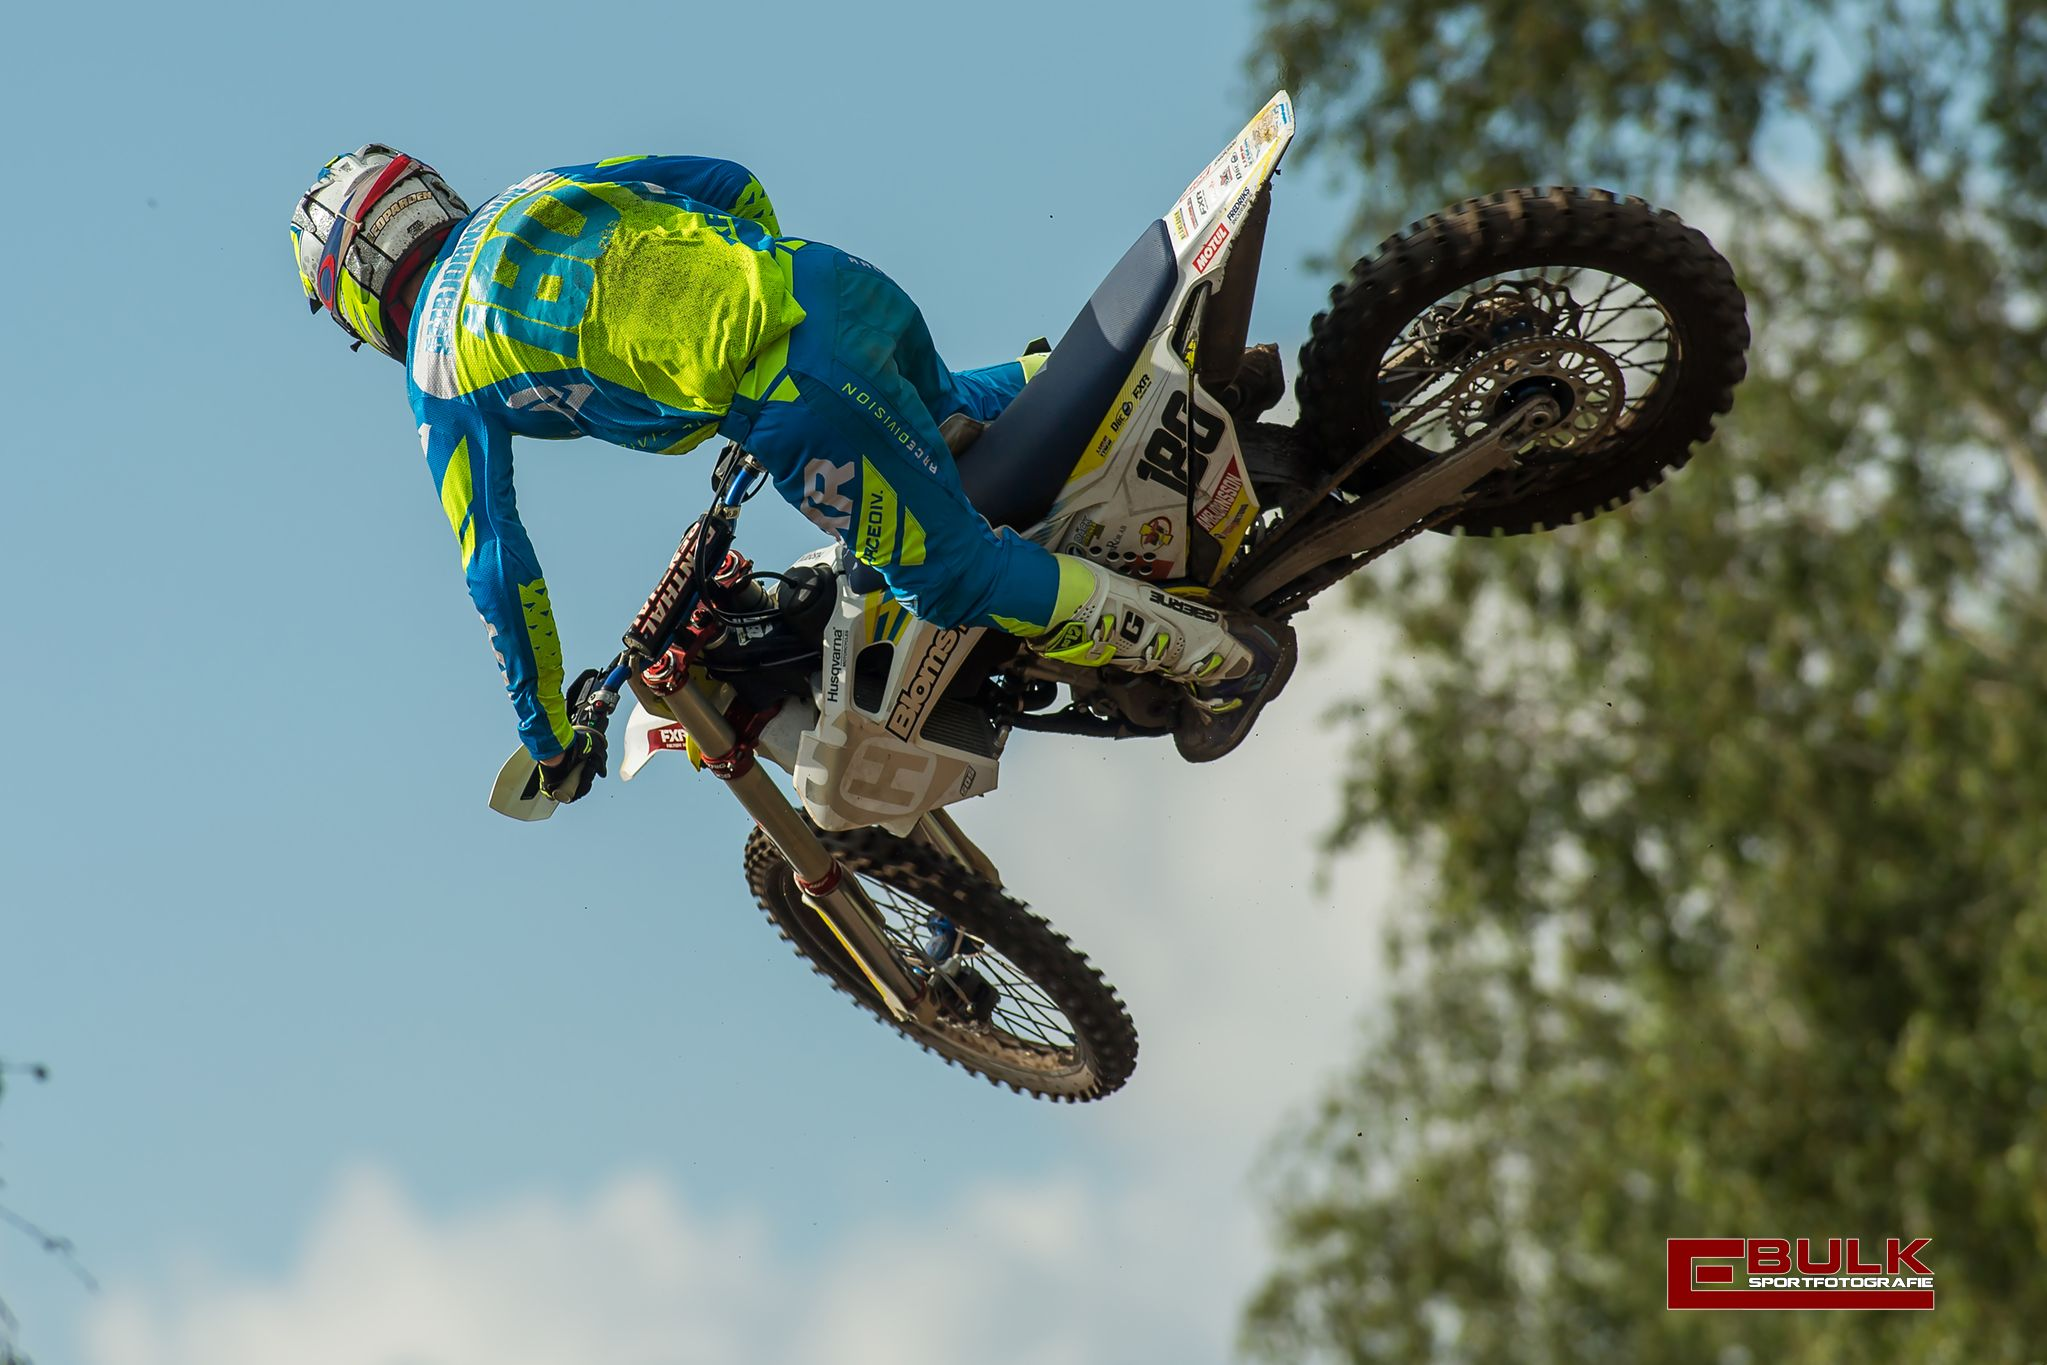 eebs0522-ed_bulk_sportfotografie